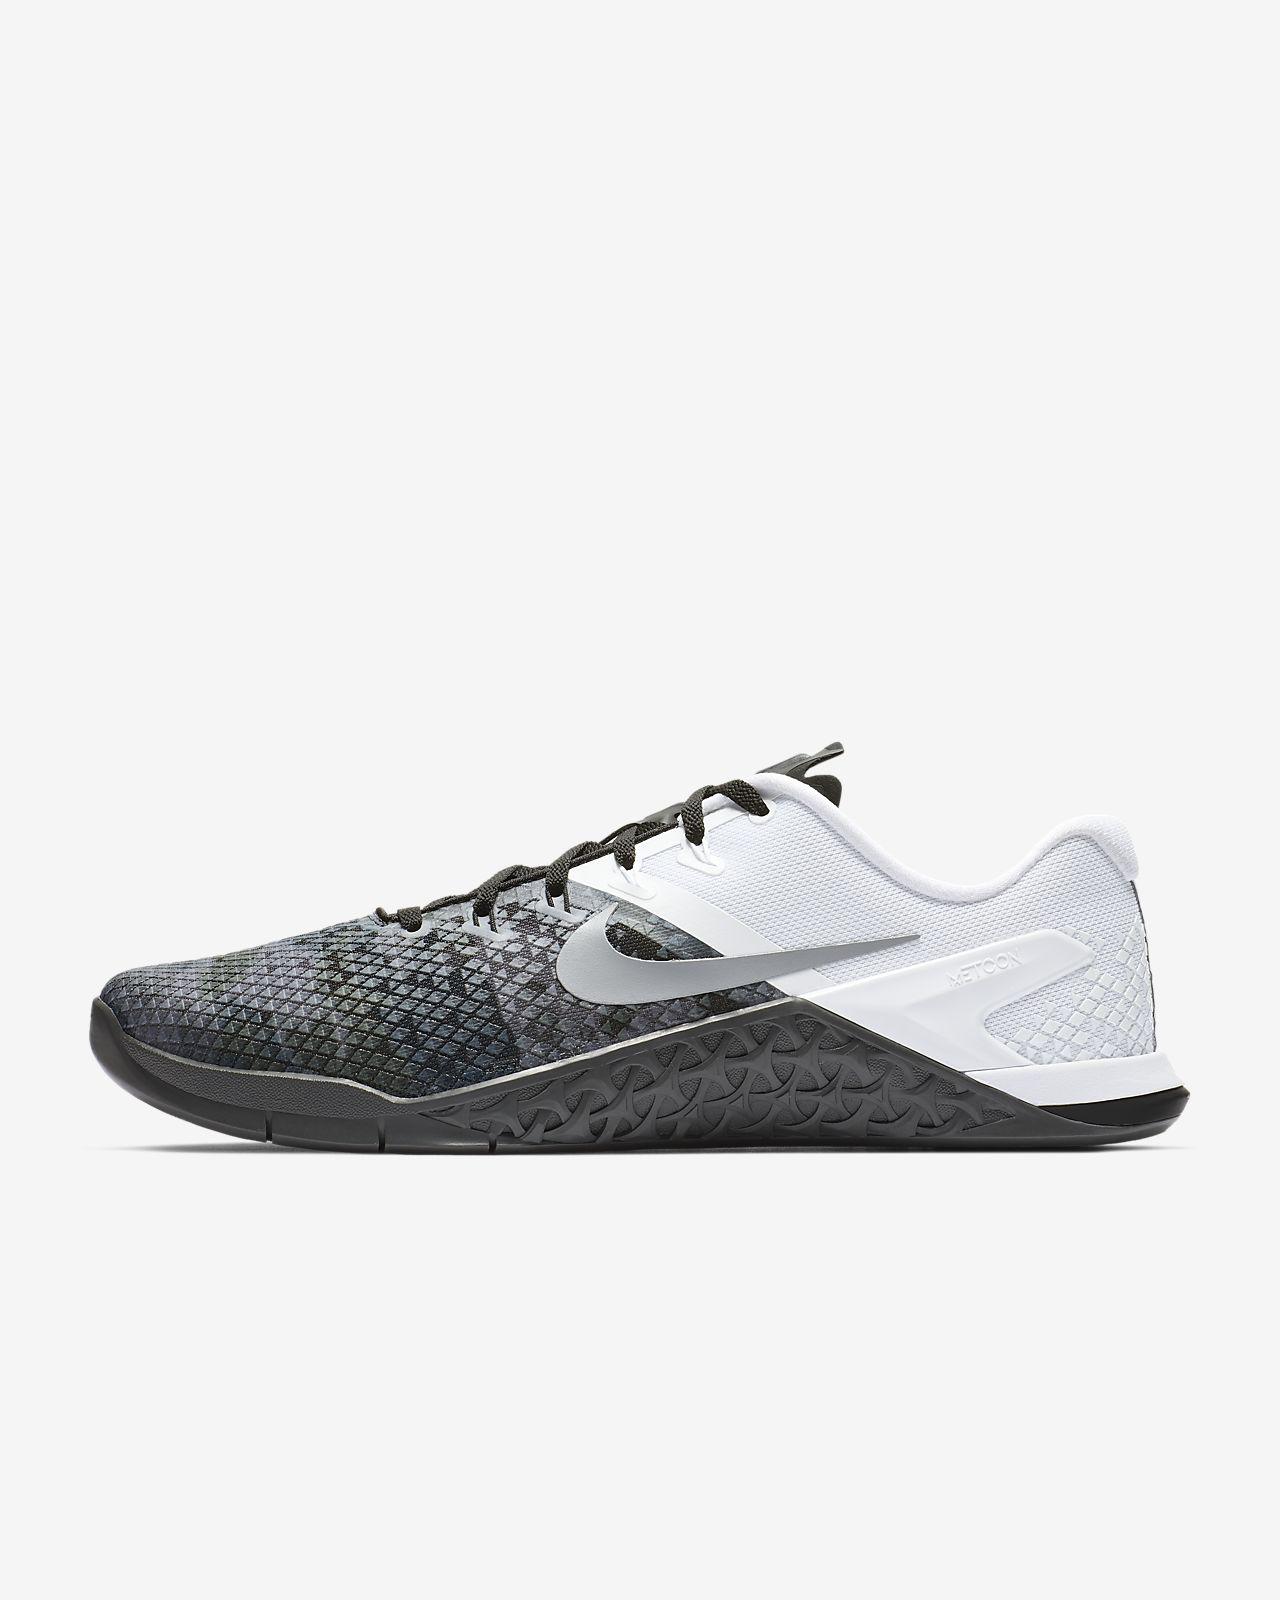 Nike Metcon 4 XD 男子训练鞋